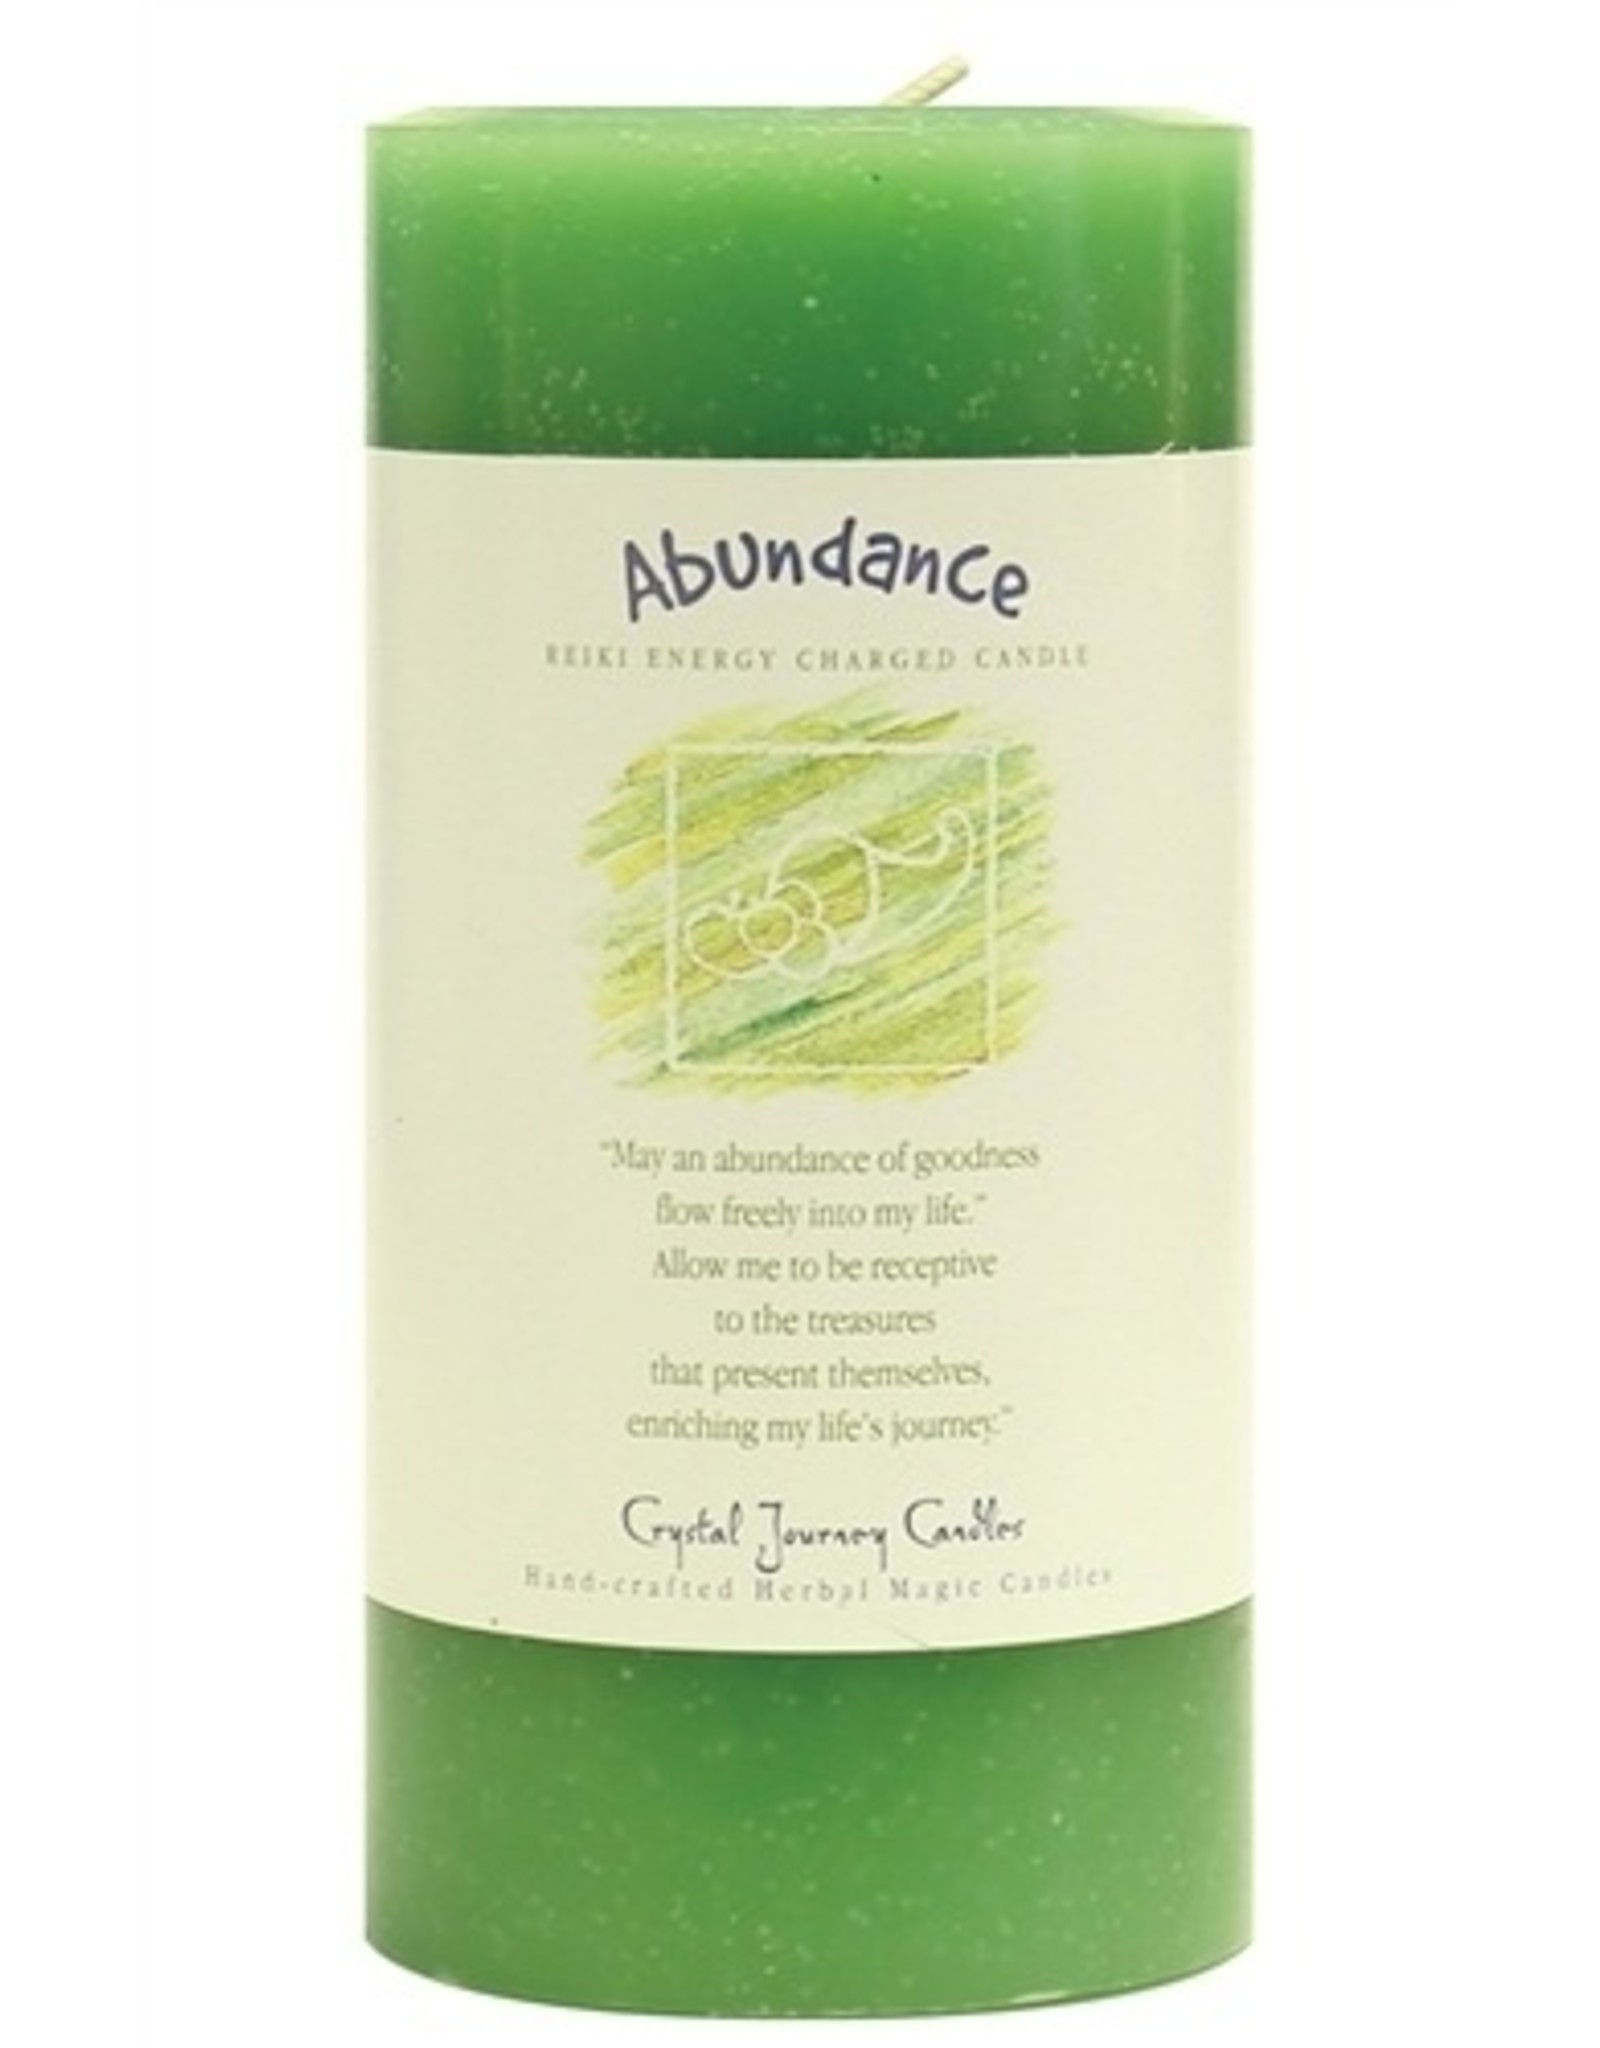 Crystal Journey Abundance Candle